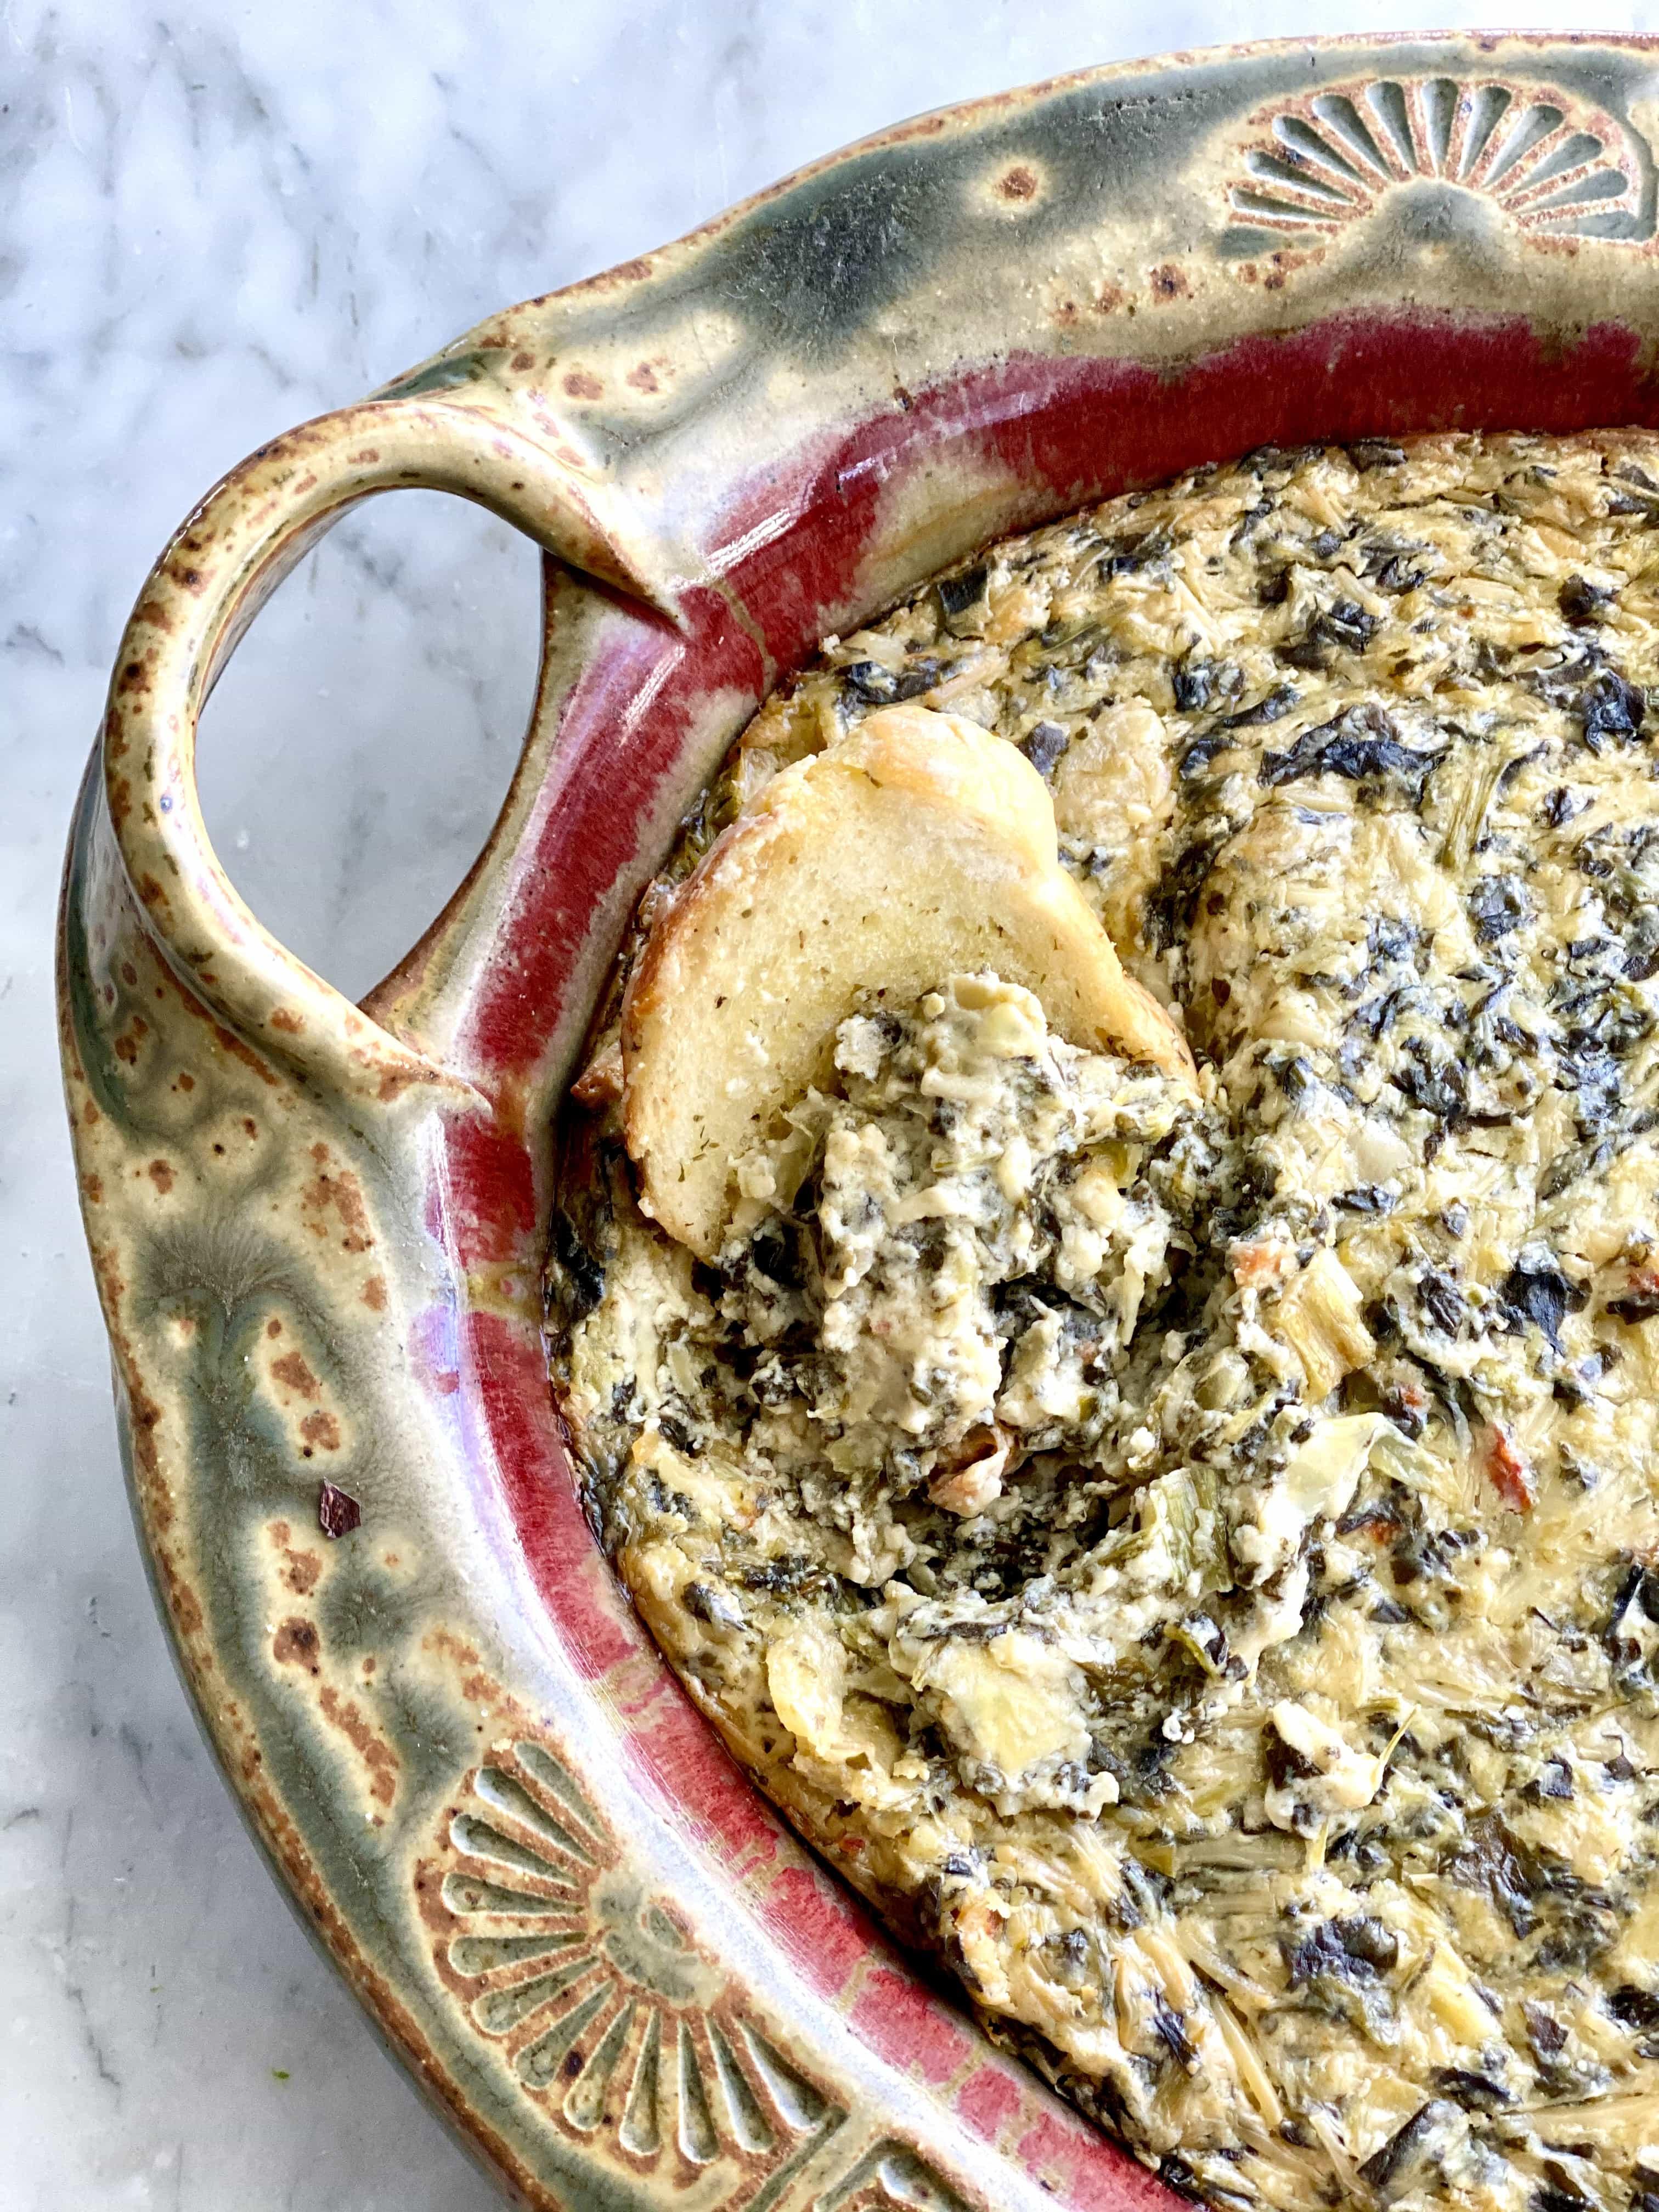 spinach artichoke dip with crostini